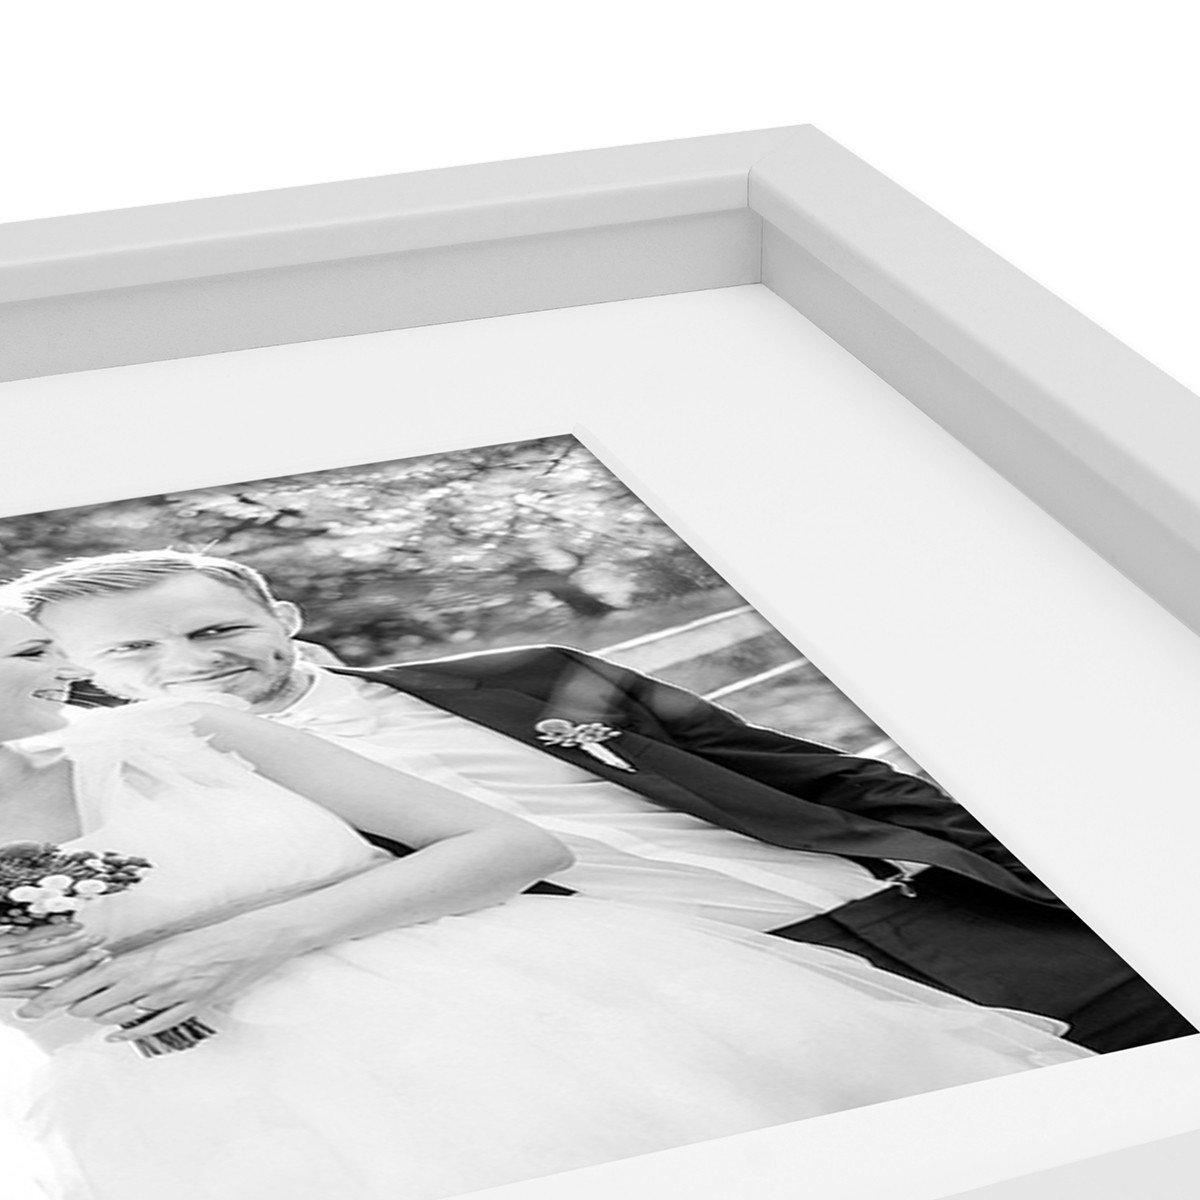 PHOTOLINI 2er Set 3D-Bilderrahmen Objektrahmen 20x20 cm 3D-Rahmen ...